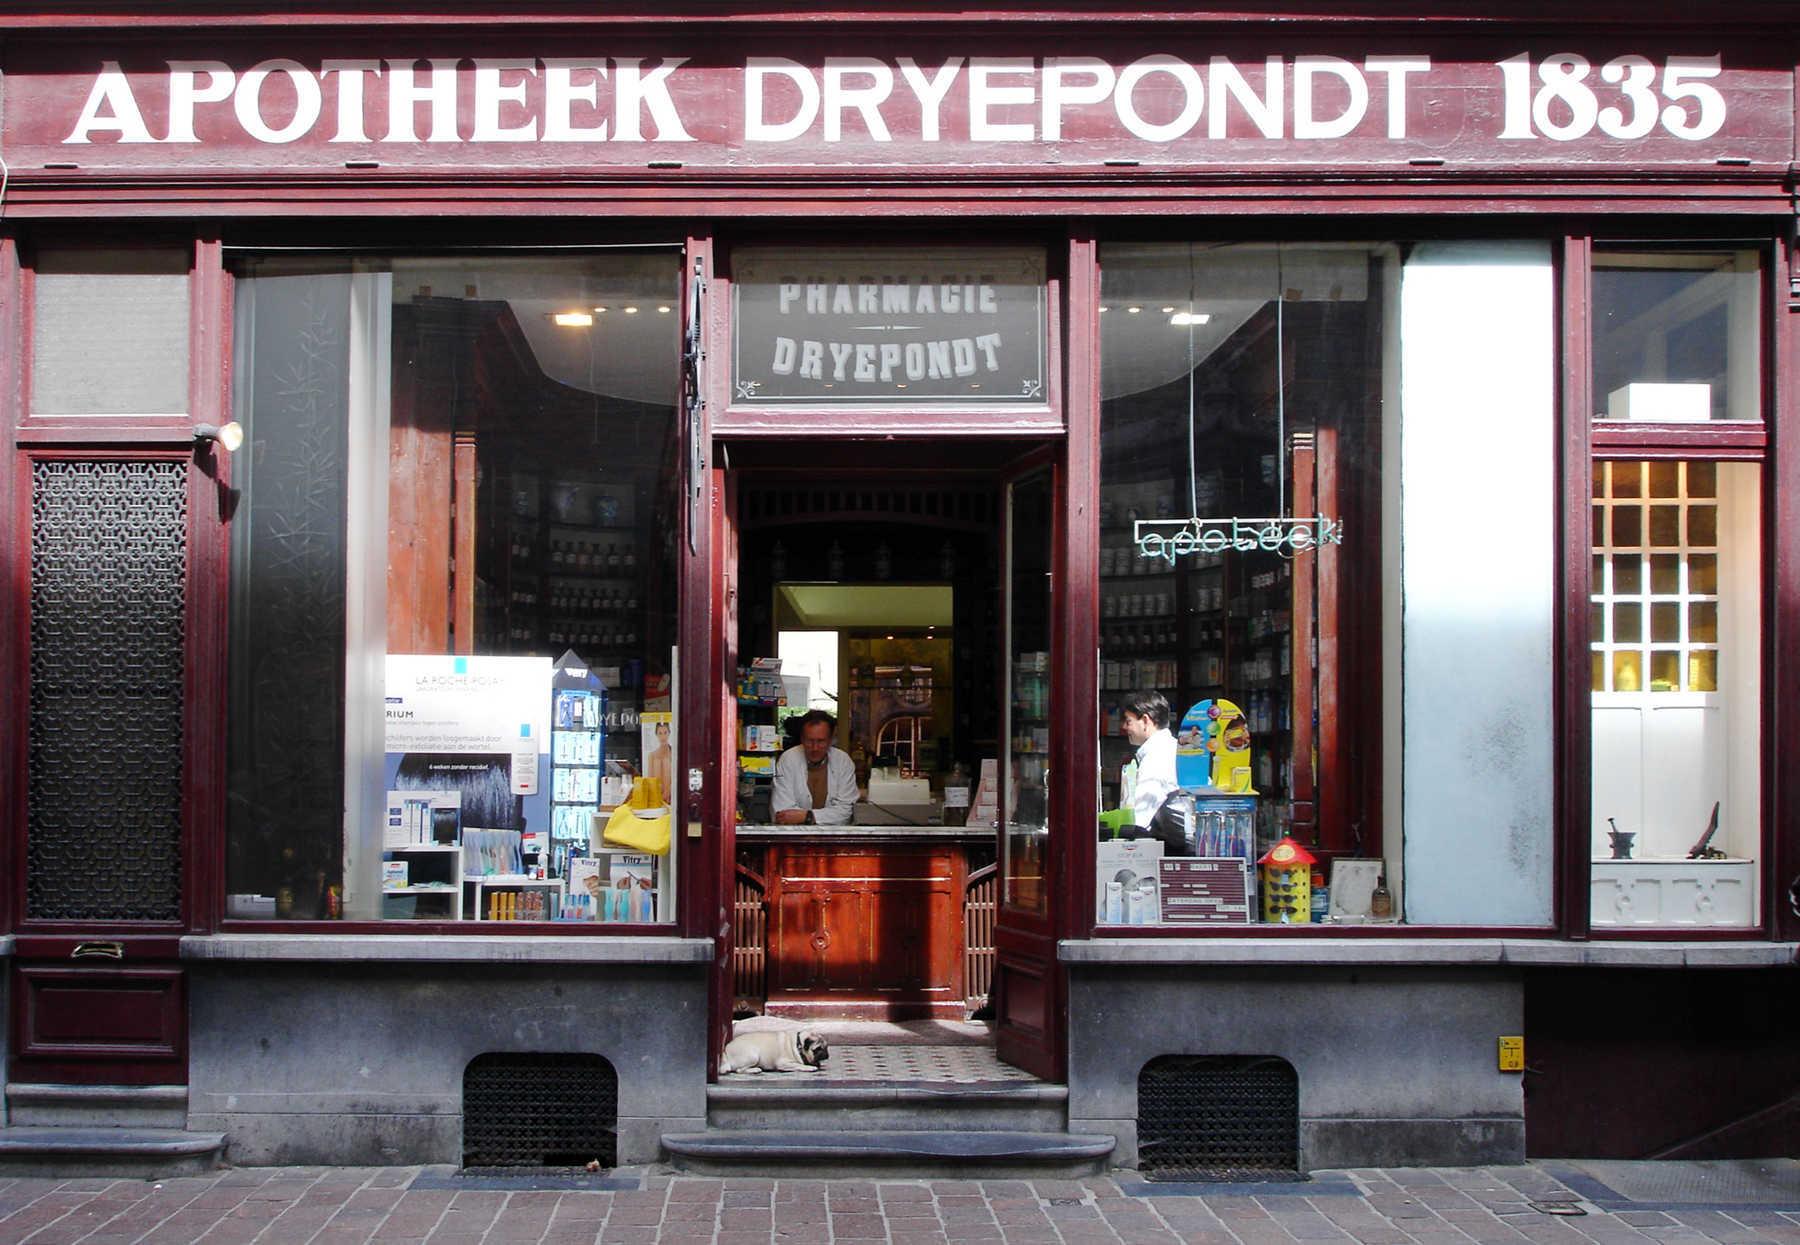 Pharmacy, Netherlands